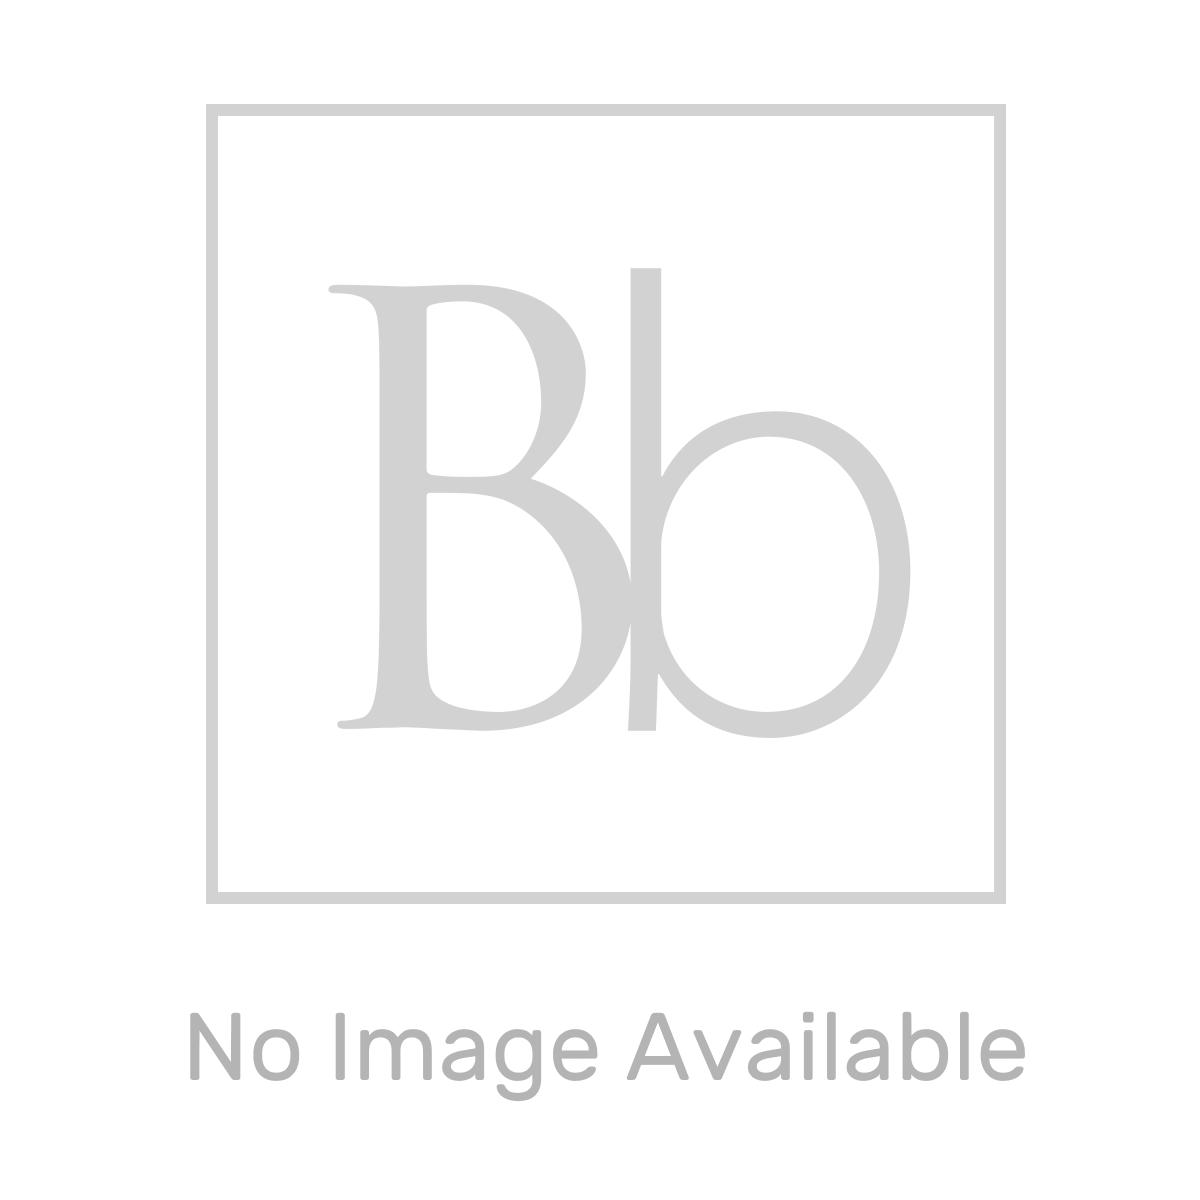 Nuie Athena Grey Avola 2 Drawer Floor Standing Vanity Unit with 18mm Worktop 800mm Line Drawing